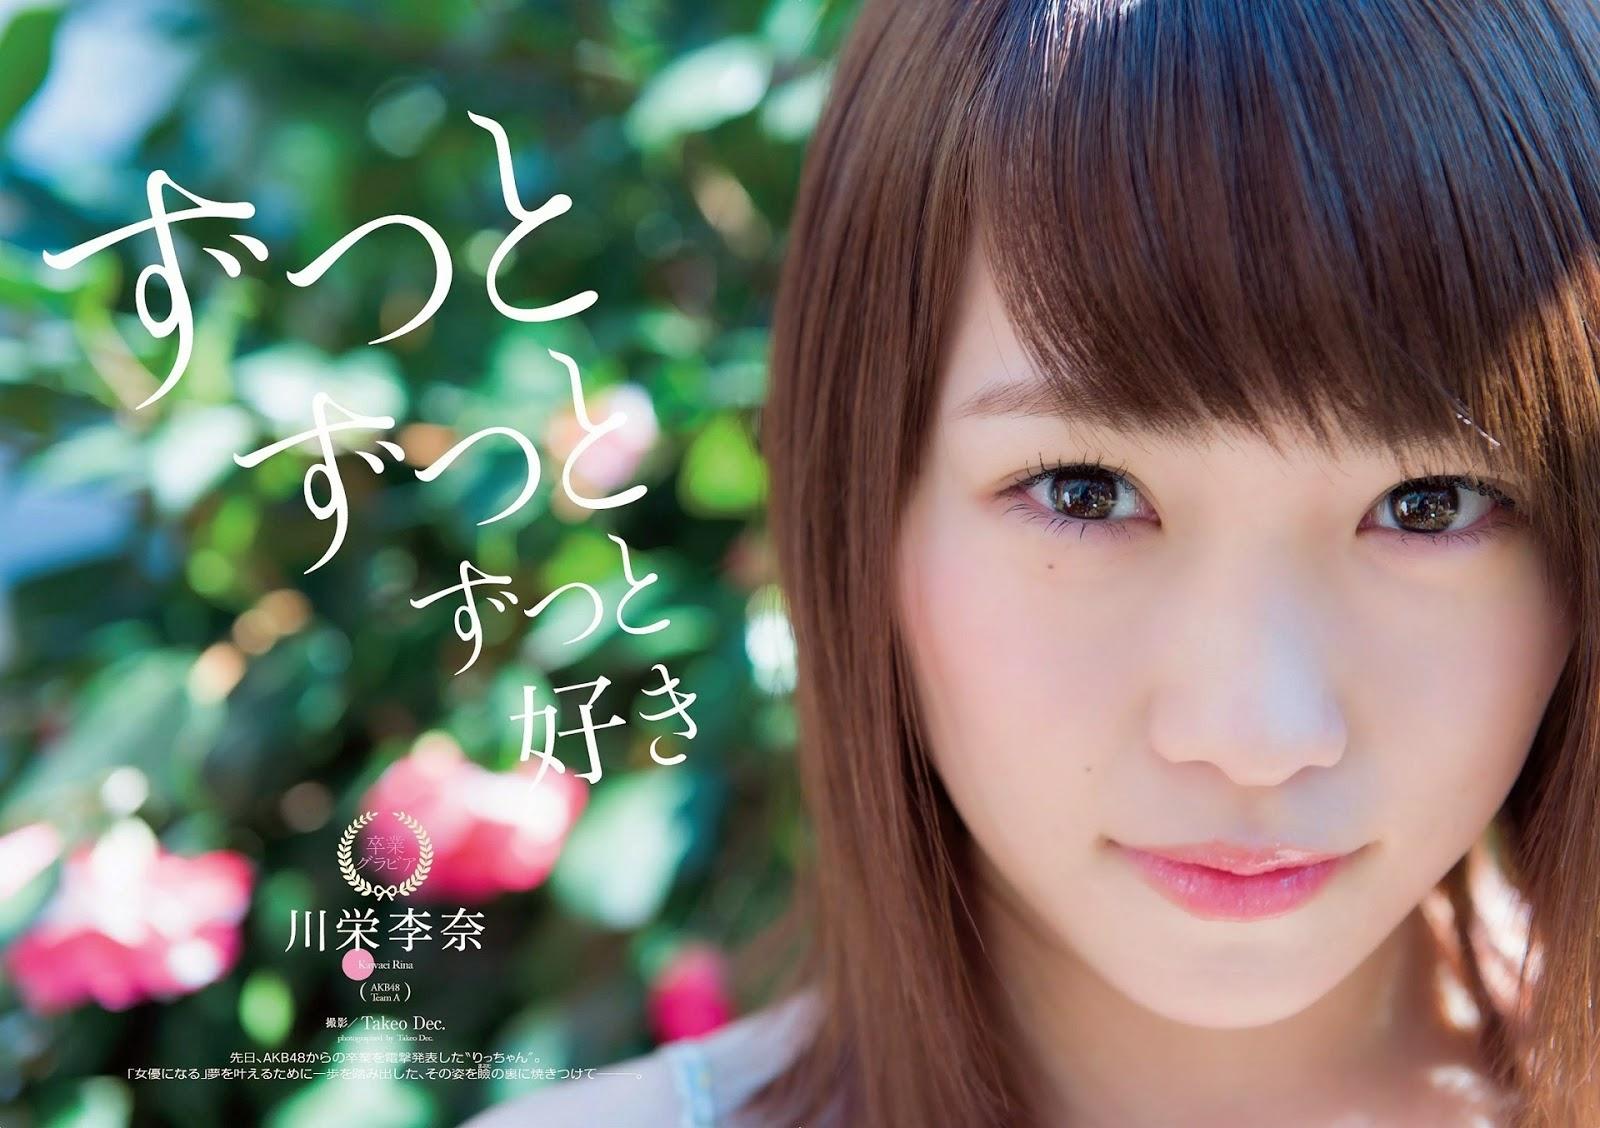 Kawaei Rina 川栄李奈 Weekly Playboy 週刊プレイボーイ April 2015 Wallpaper HD